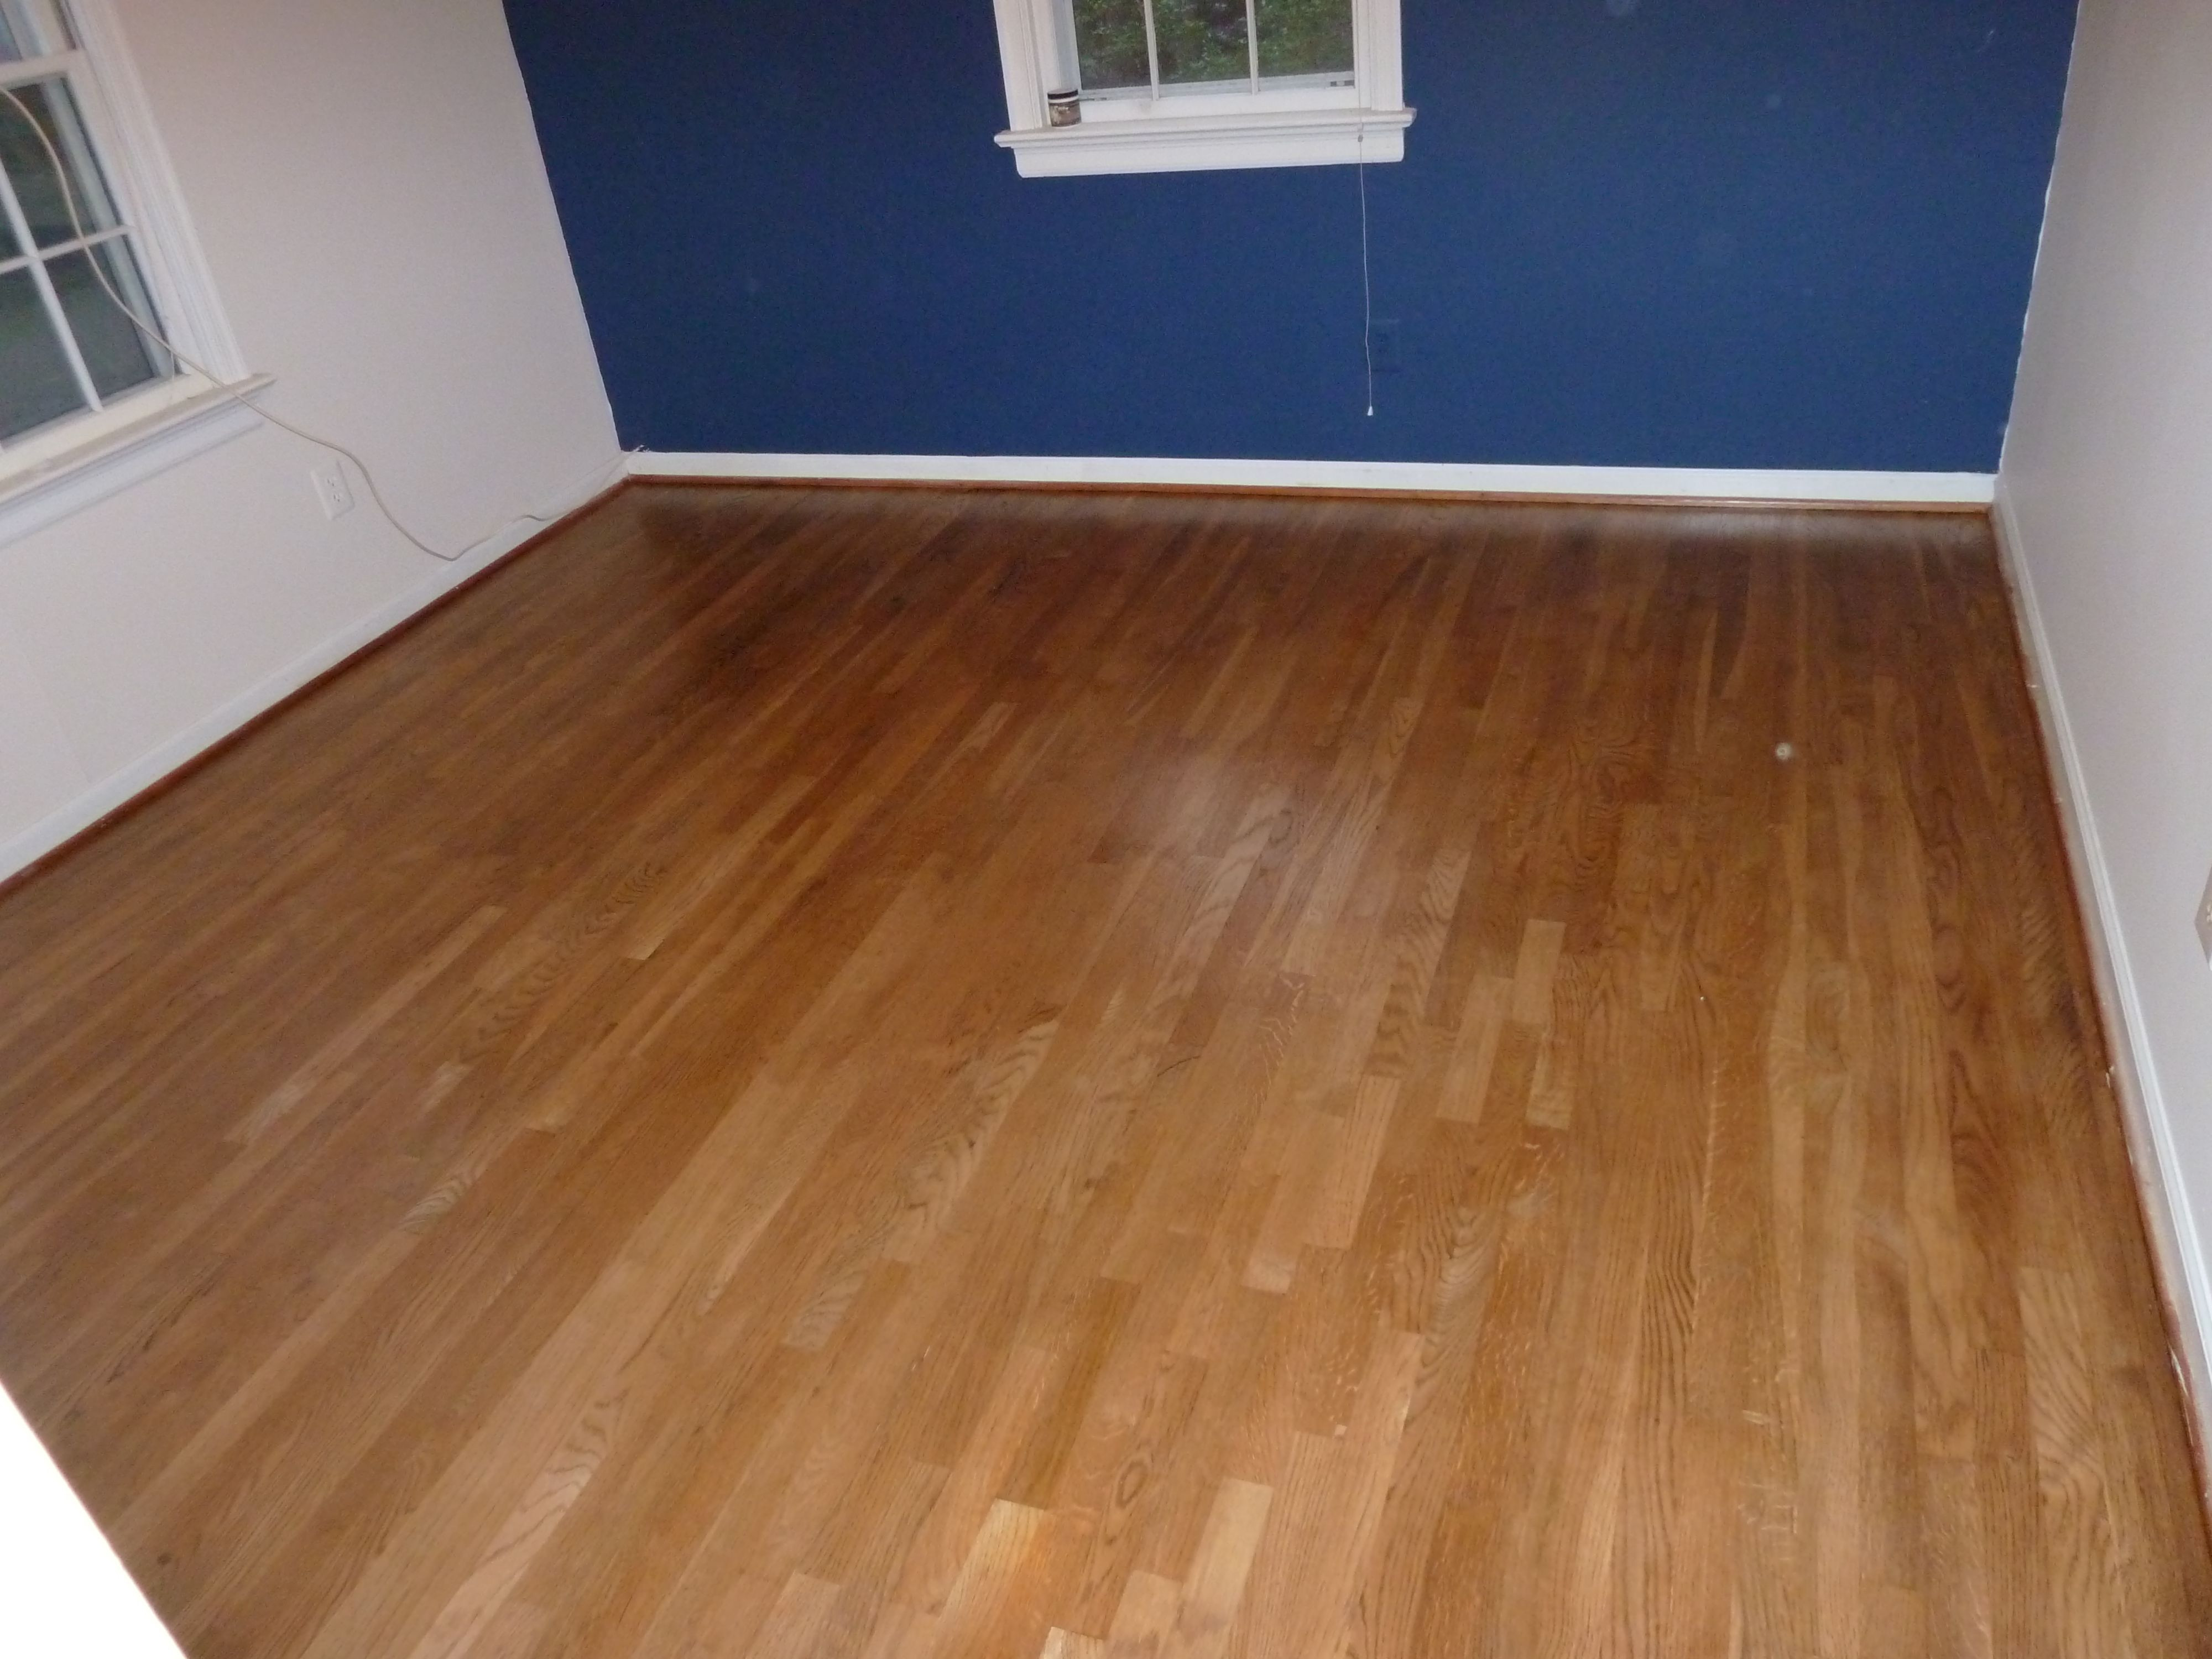 hardwood floor refinishing naperville il of red oak hardwood floor stained golden oak and coated with bona mega in red oak hardwood floor stained golden oak and coated with bona mega waterbased finish hardwood